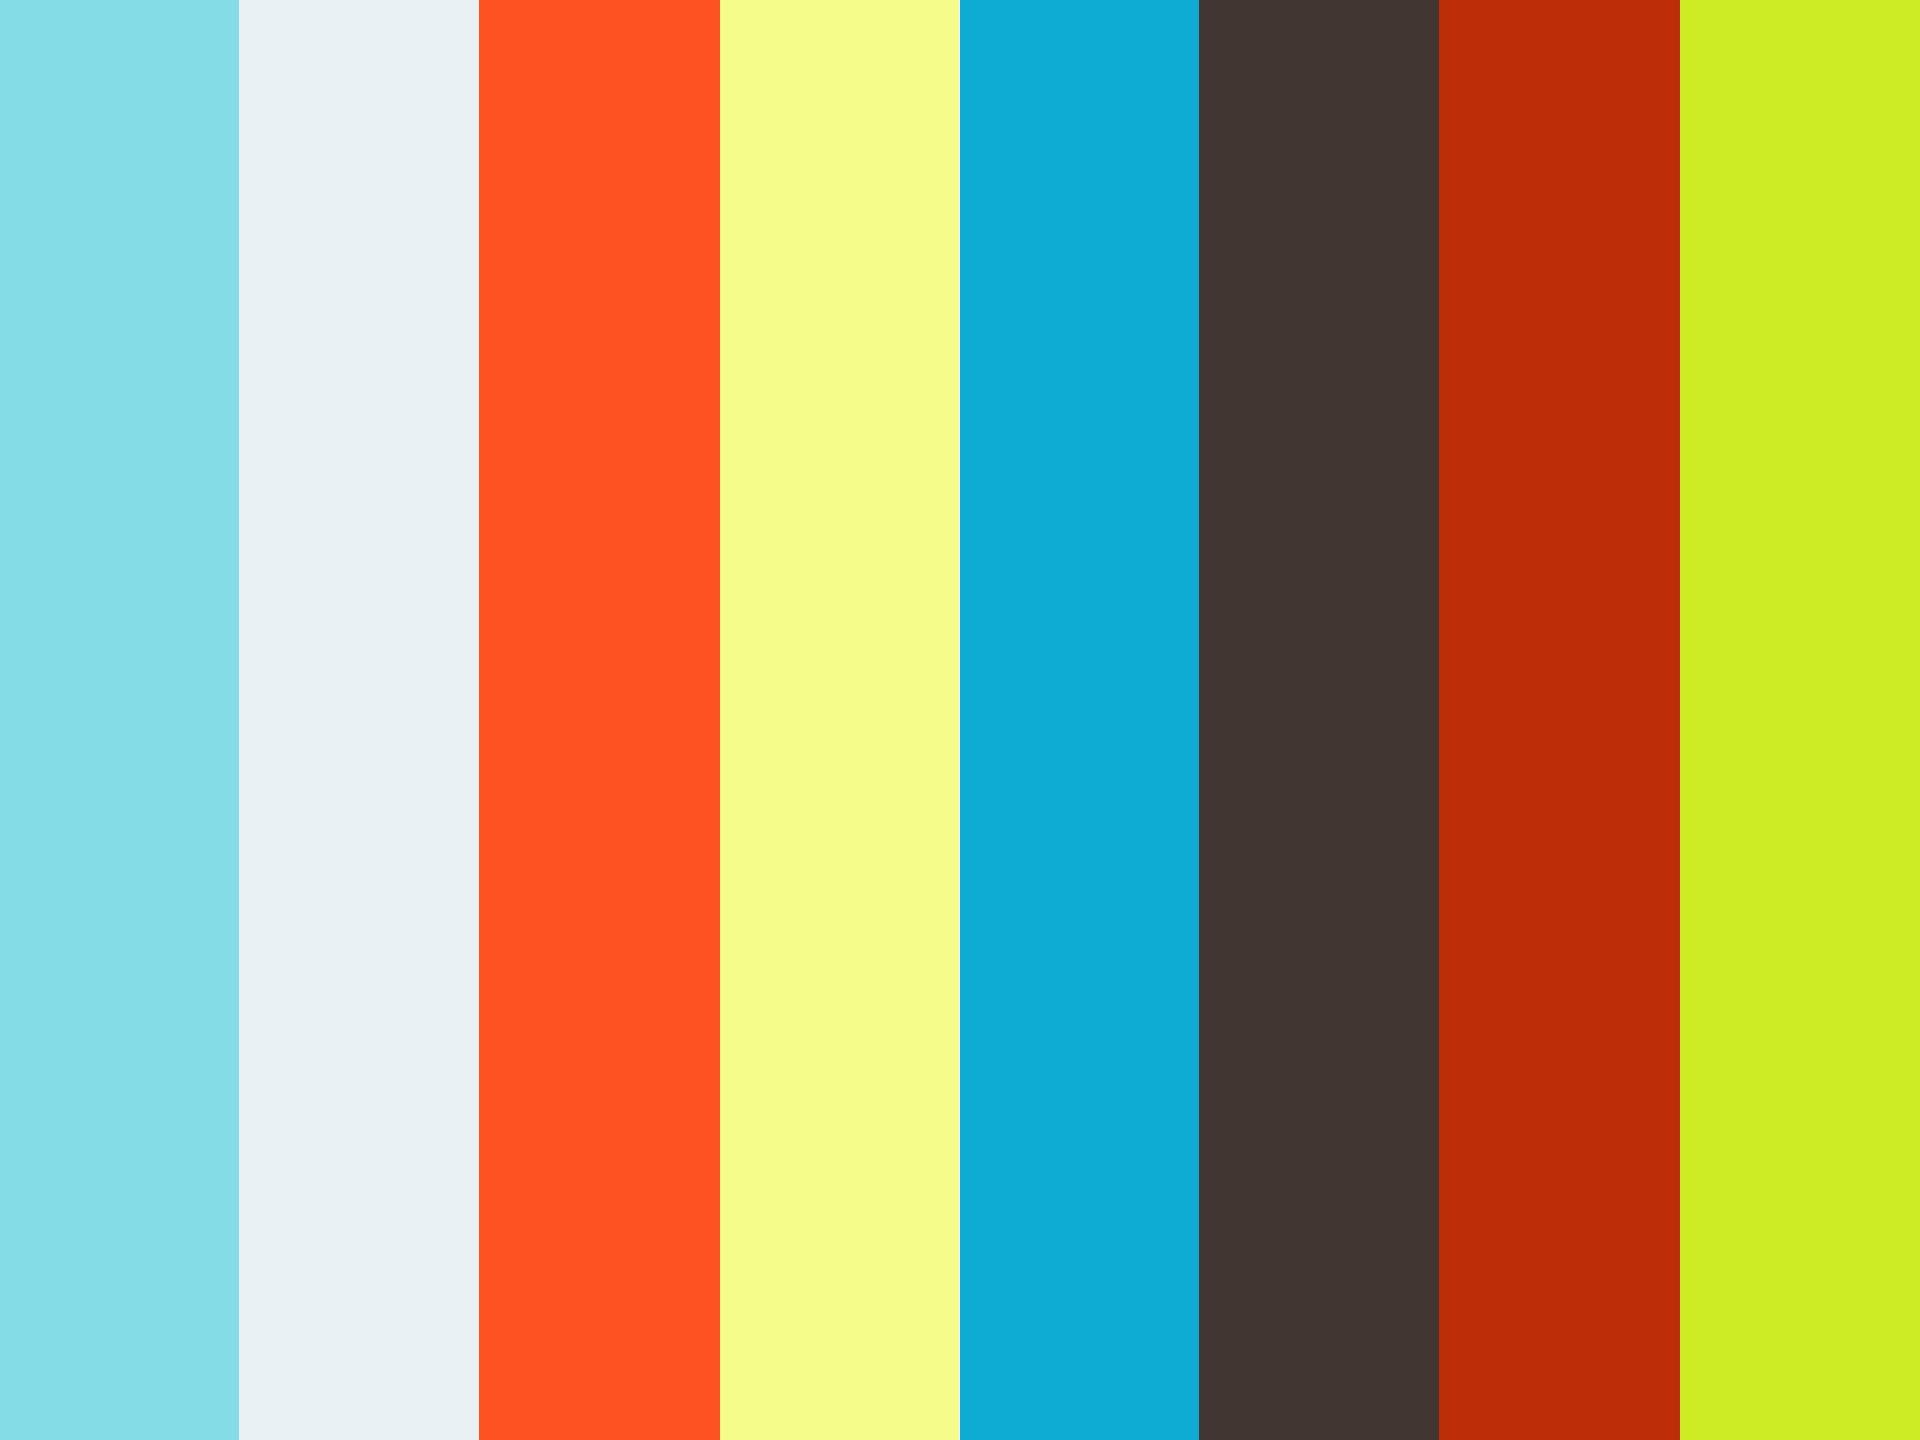 mallory moyemallory moye, mallory moye age, mallory moye singing, mallory moye for want of a nail, mallory moye wiki, mallory moye instagram, mallory moye twitter, mallory moye facebook, mallory moye husband, mallory moye actress, mallory moye birthday, mallory moye singer, mallory moye hot, mallory moye bio, mallory moye baby, mallory moye feet, mallory moye islands in the stream, mallory moye and ross philips, mallory moye wedding, mallory moye born